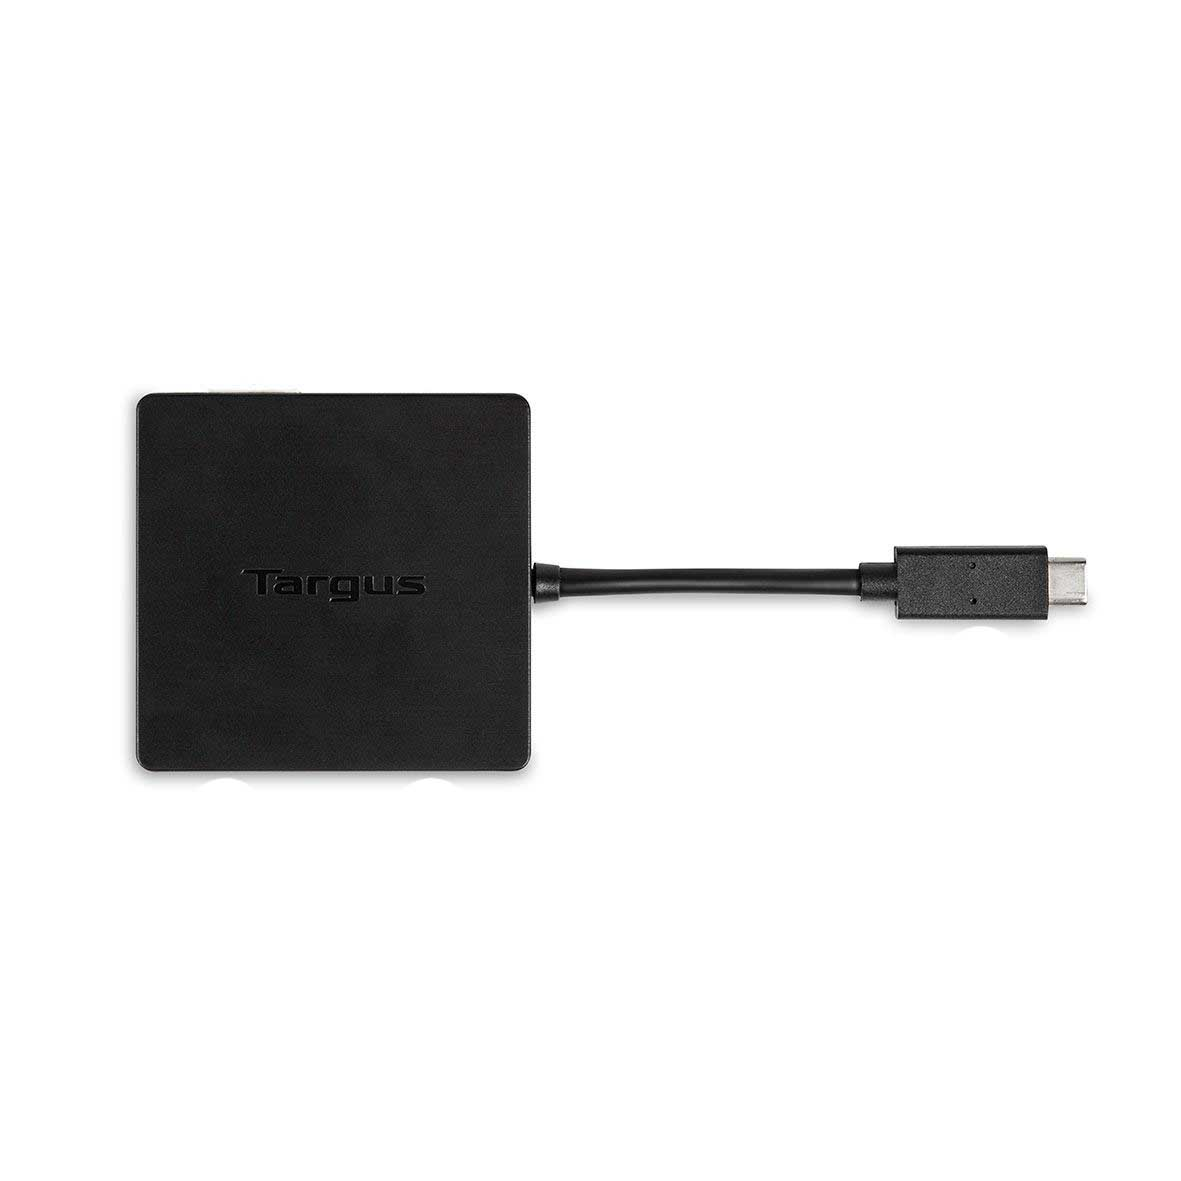 Targus USB-C Alt-Mode Travel Docking Station DOCK411EUZ - Black